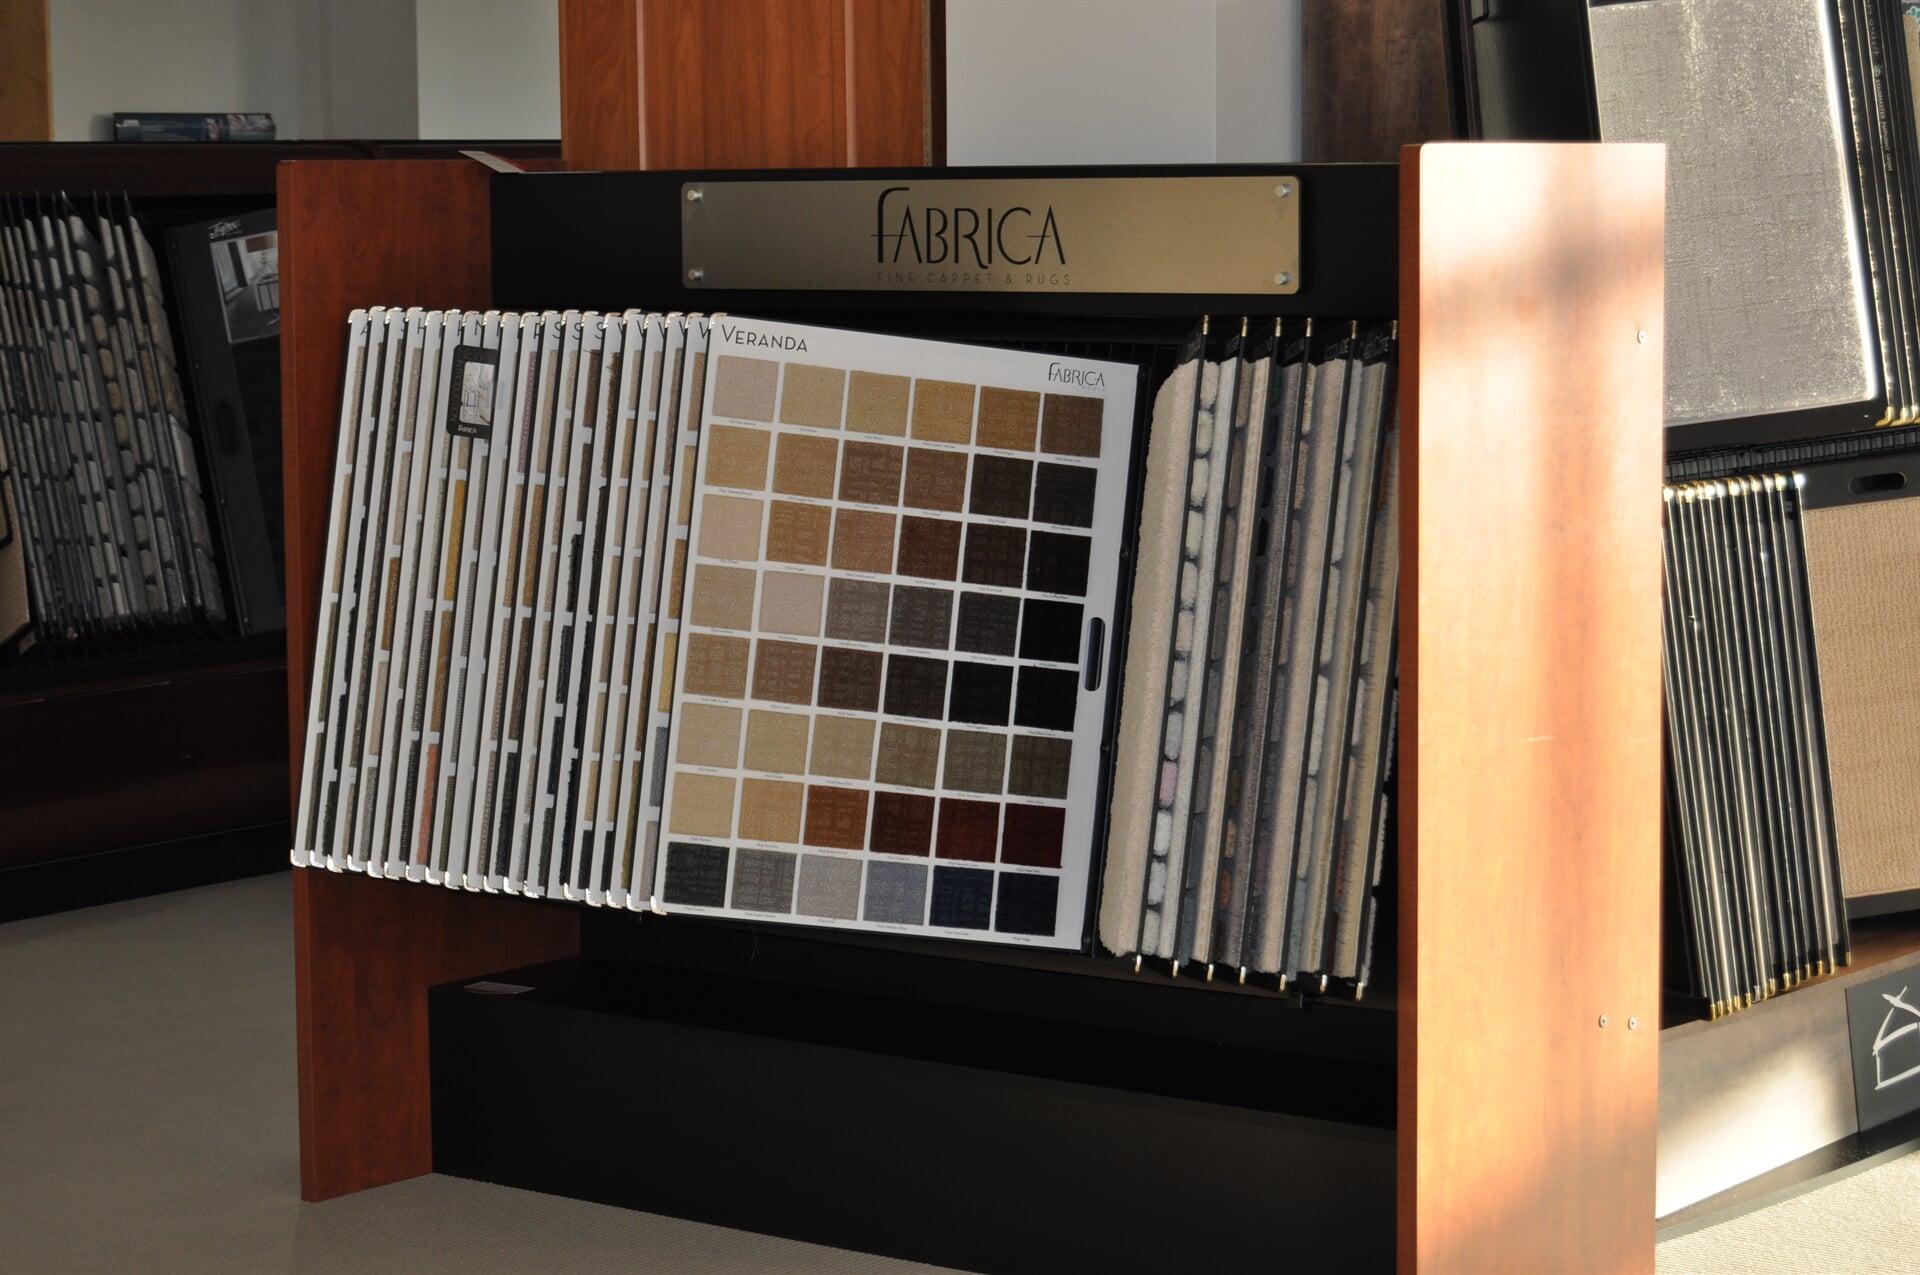 Fabrica carpet for your Nashville, TN home from Beckler's Flooring Center